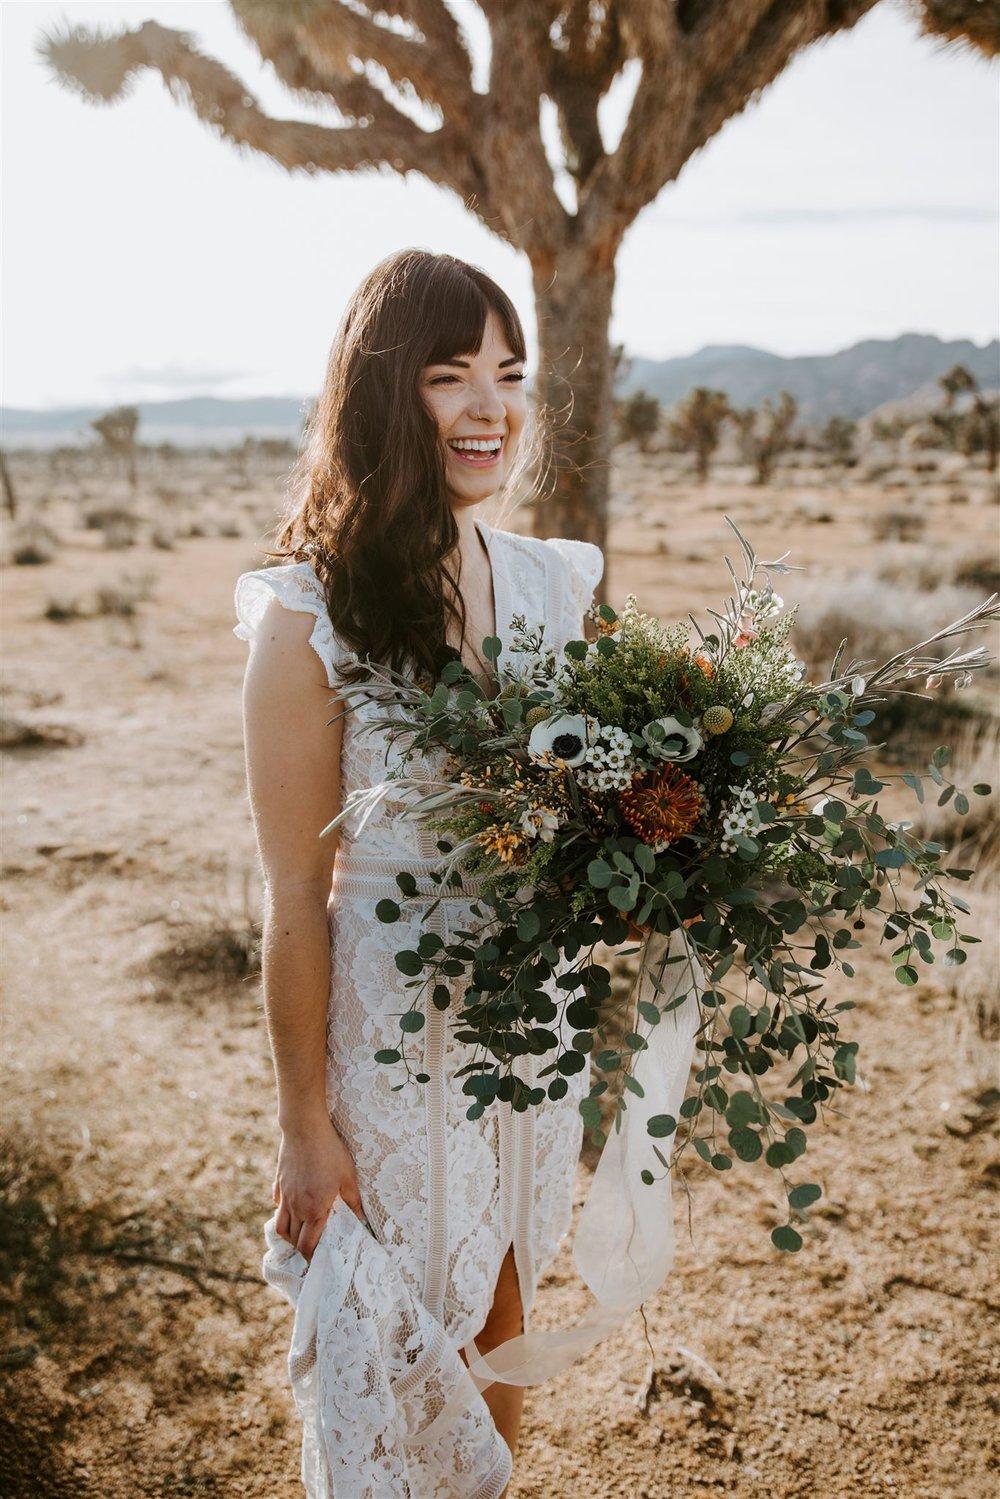 Joshua Tree CA Elopement Wedding  Photographer May Iosotaluno 31.jpg